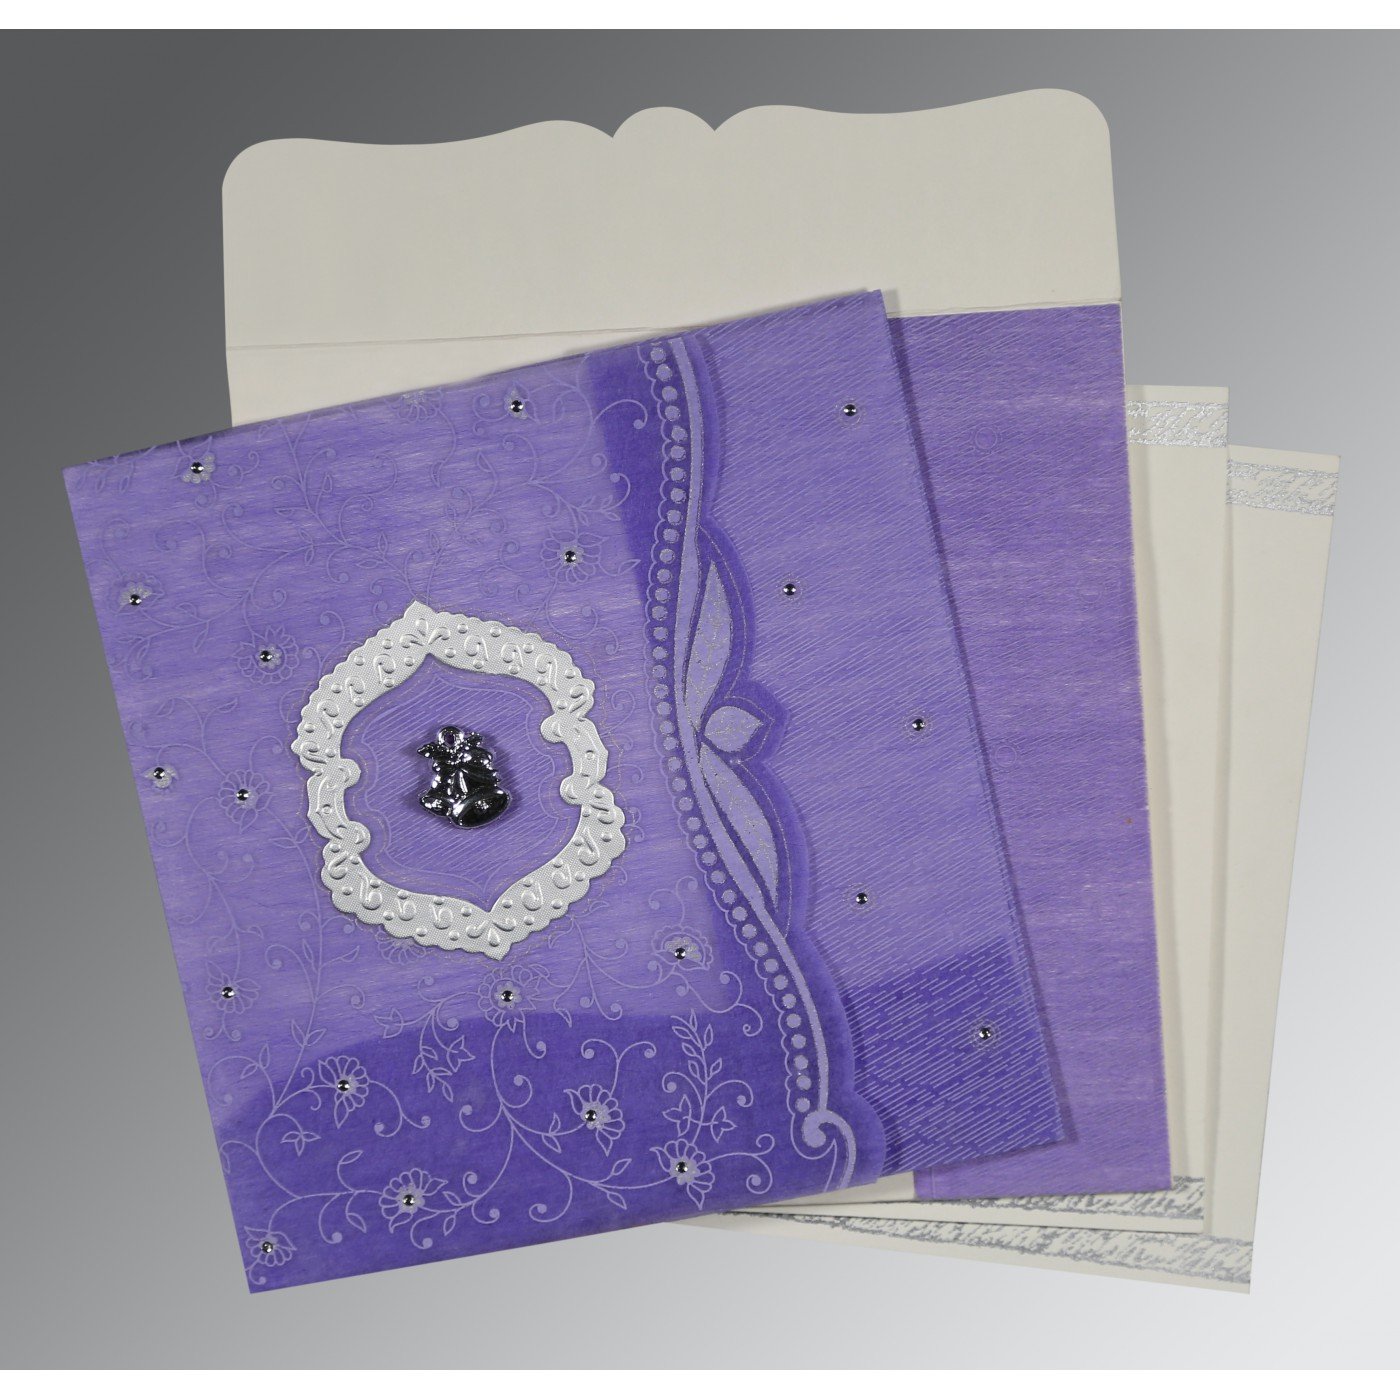 DARK PURPLE SHIMMERY FLORAL THEMED - EMBOSSED WEDDING CARD : C-8209C - 123WeddingCards